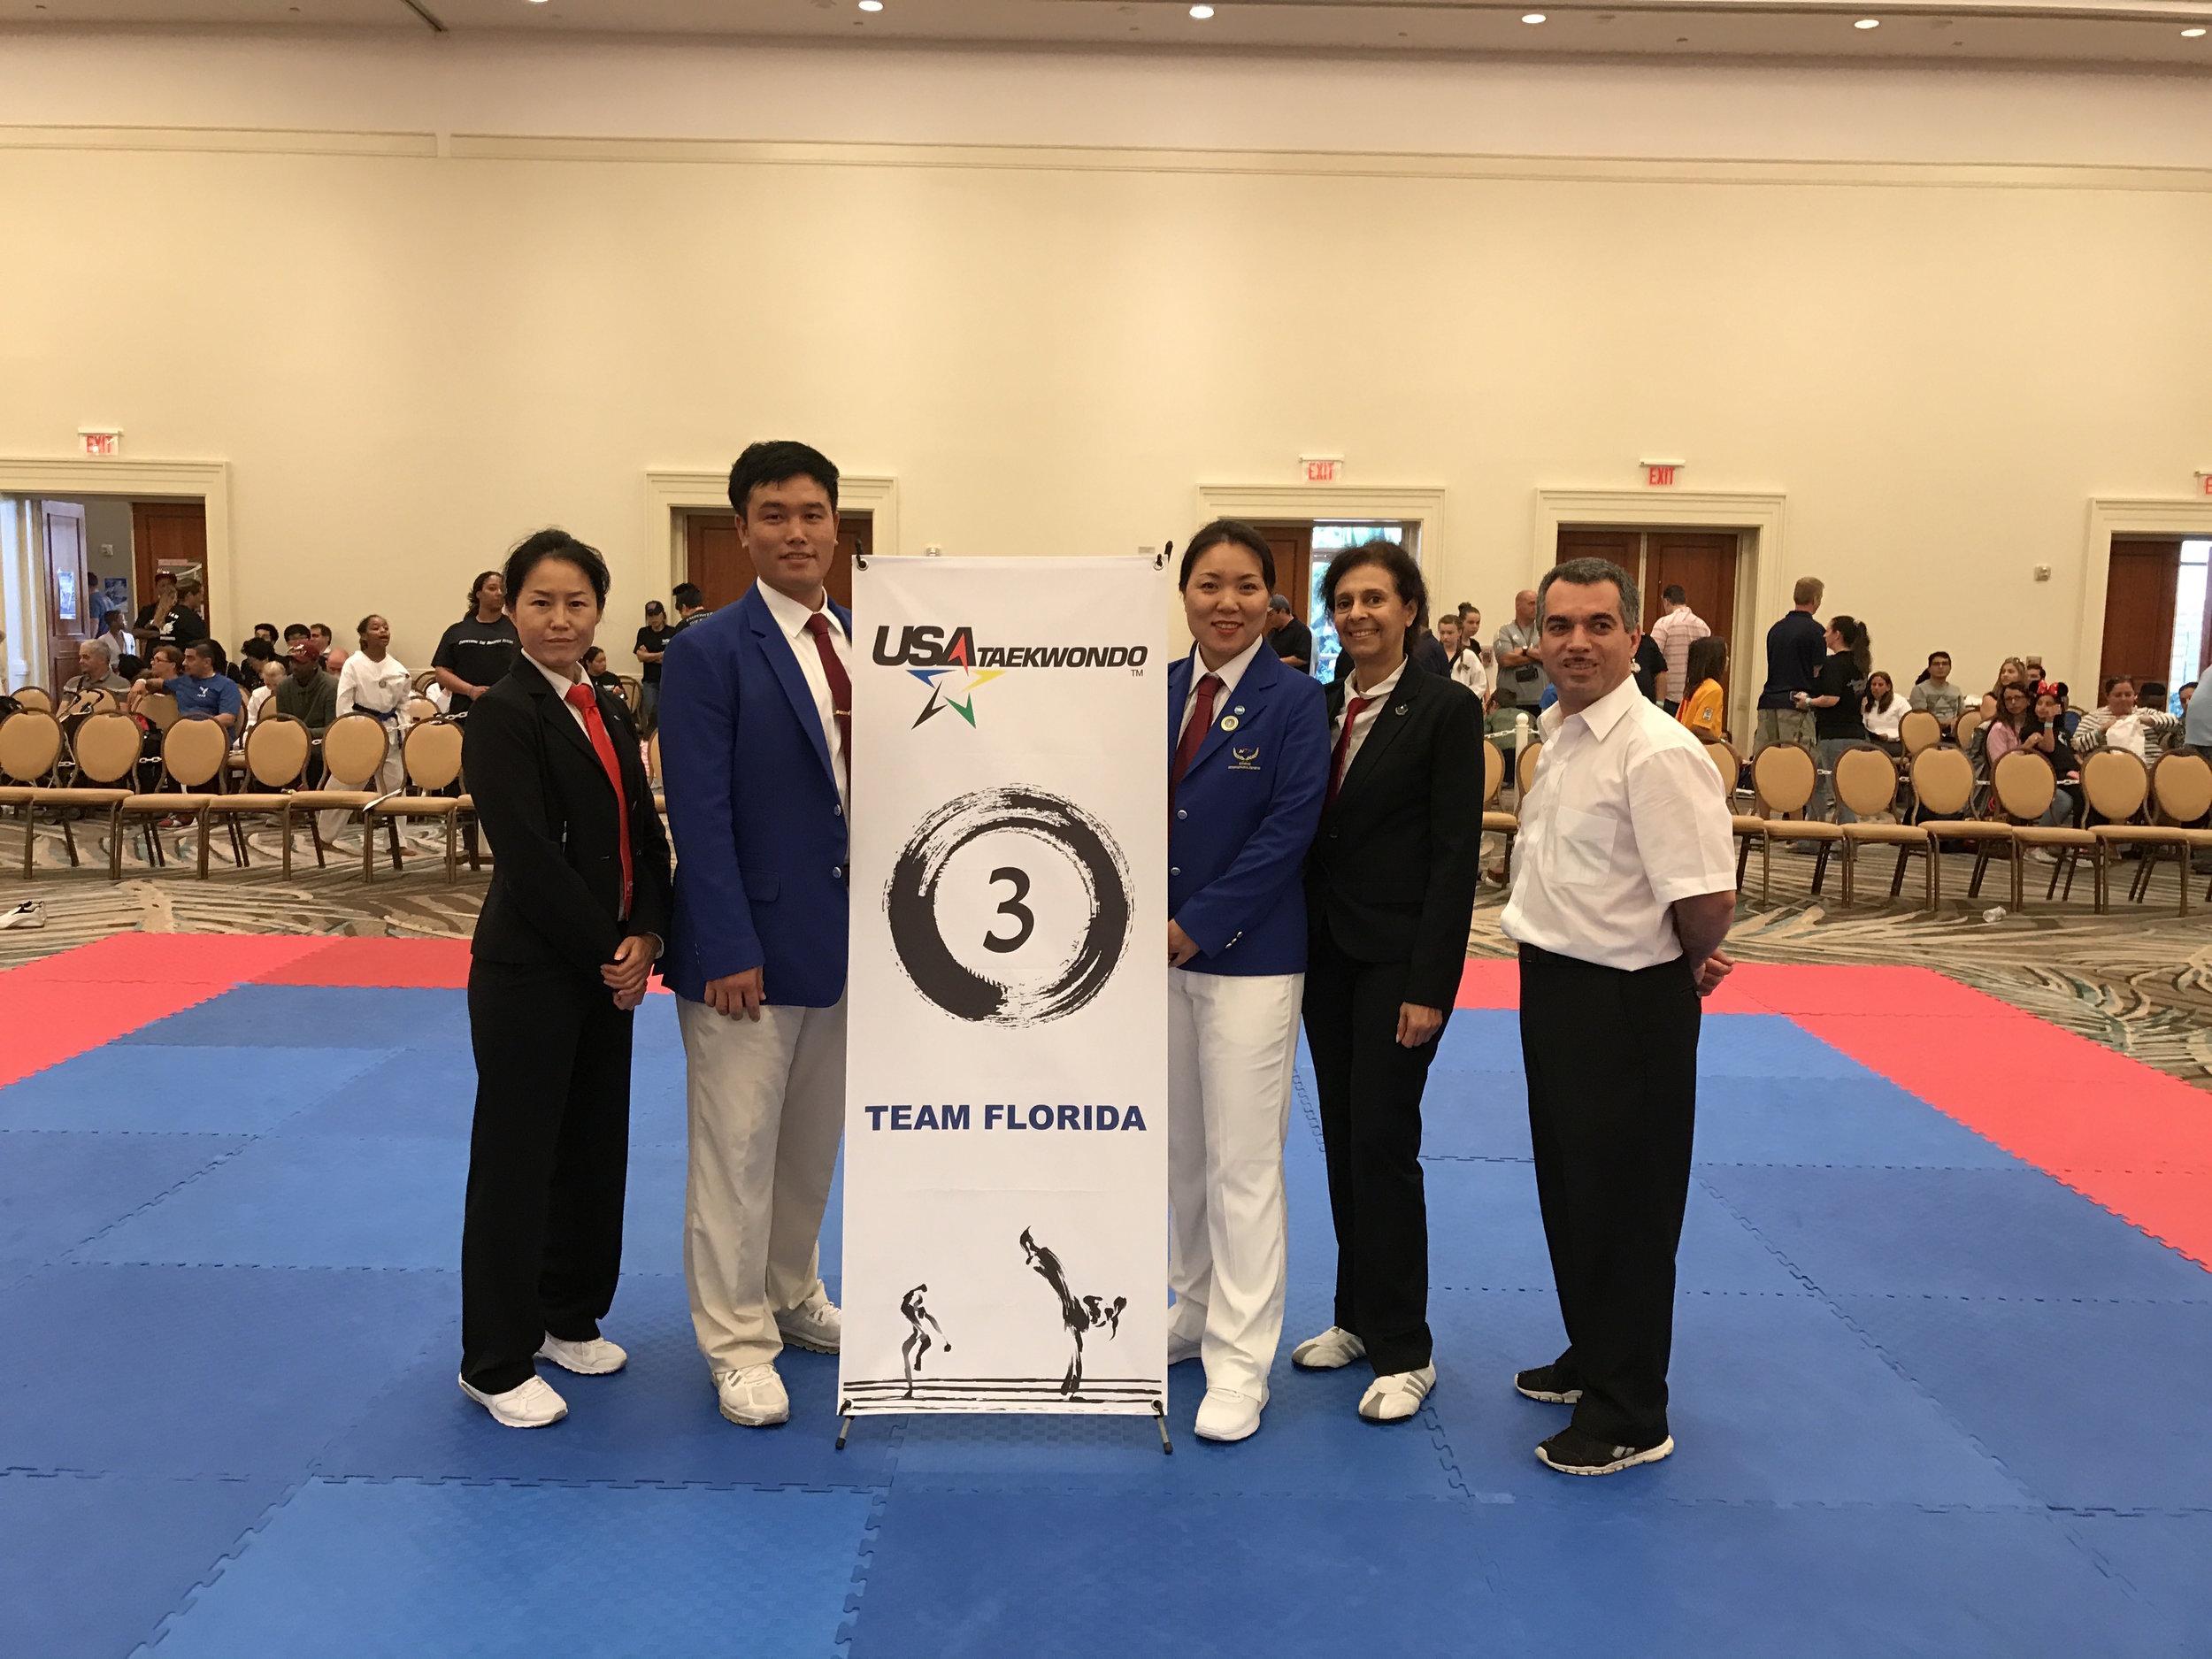 Taekwondo Florida State Championship Referee - Orchid Lim- American Tigers Martial Arts Owner